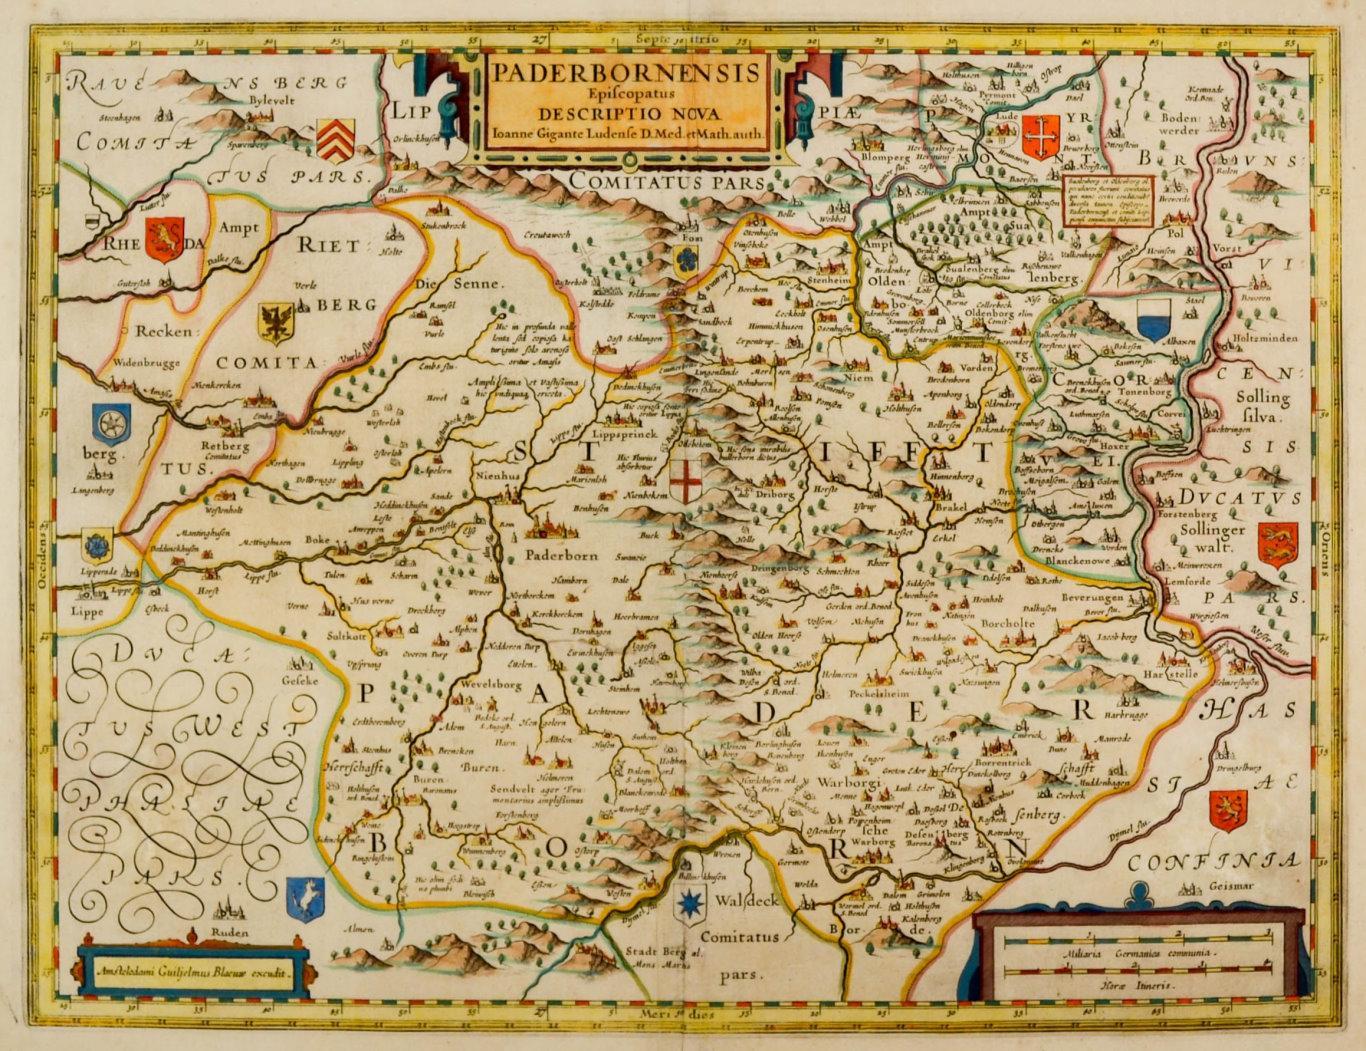 Karte Paderborn.Paderborn Karte